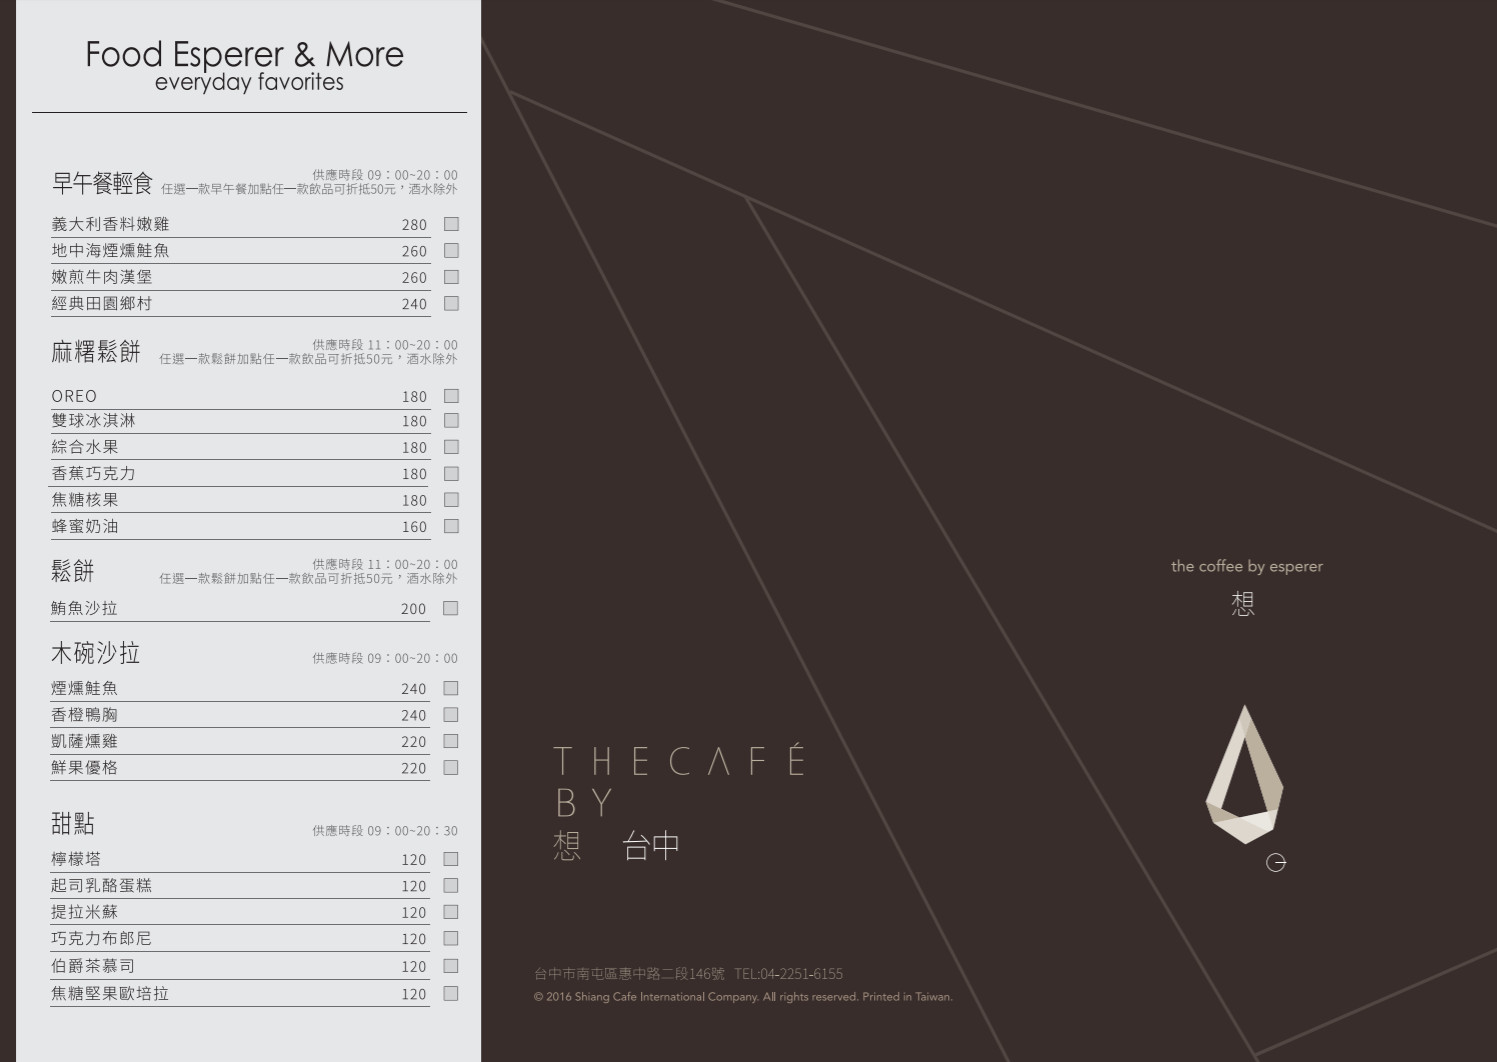 The Cafe By想台中(隱身在落羽松林的早午餐咖啡廳)